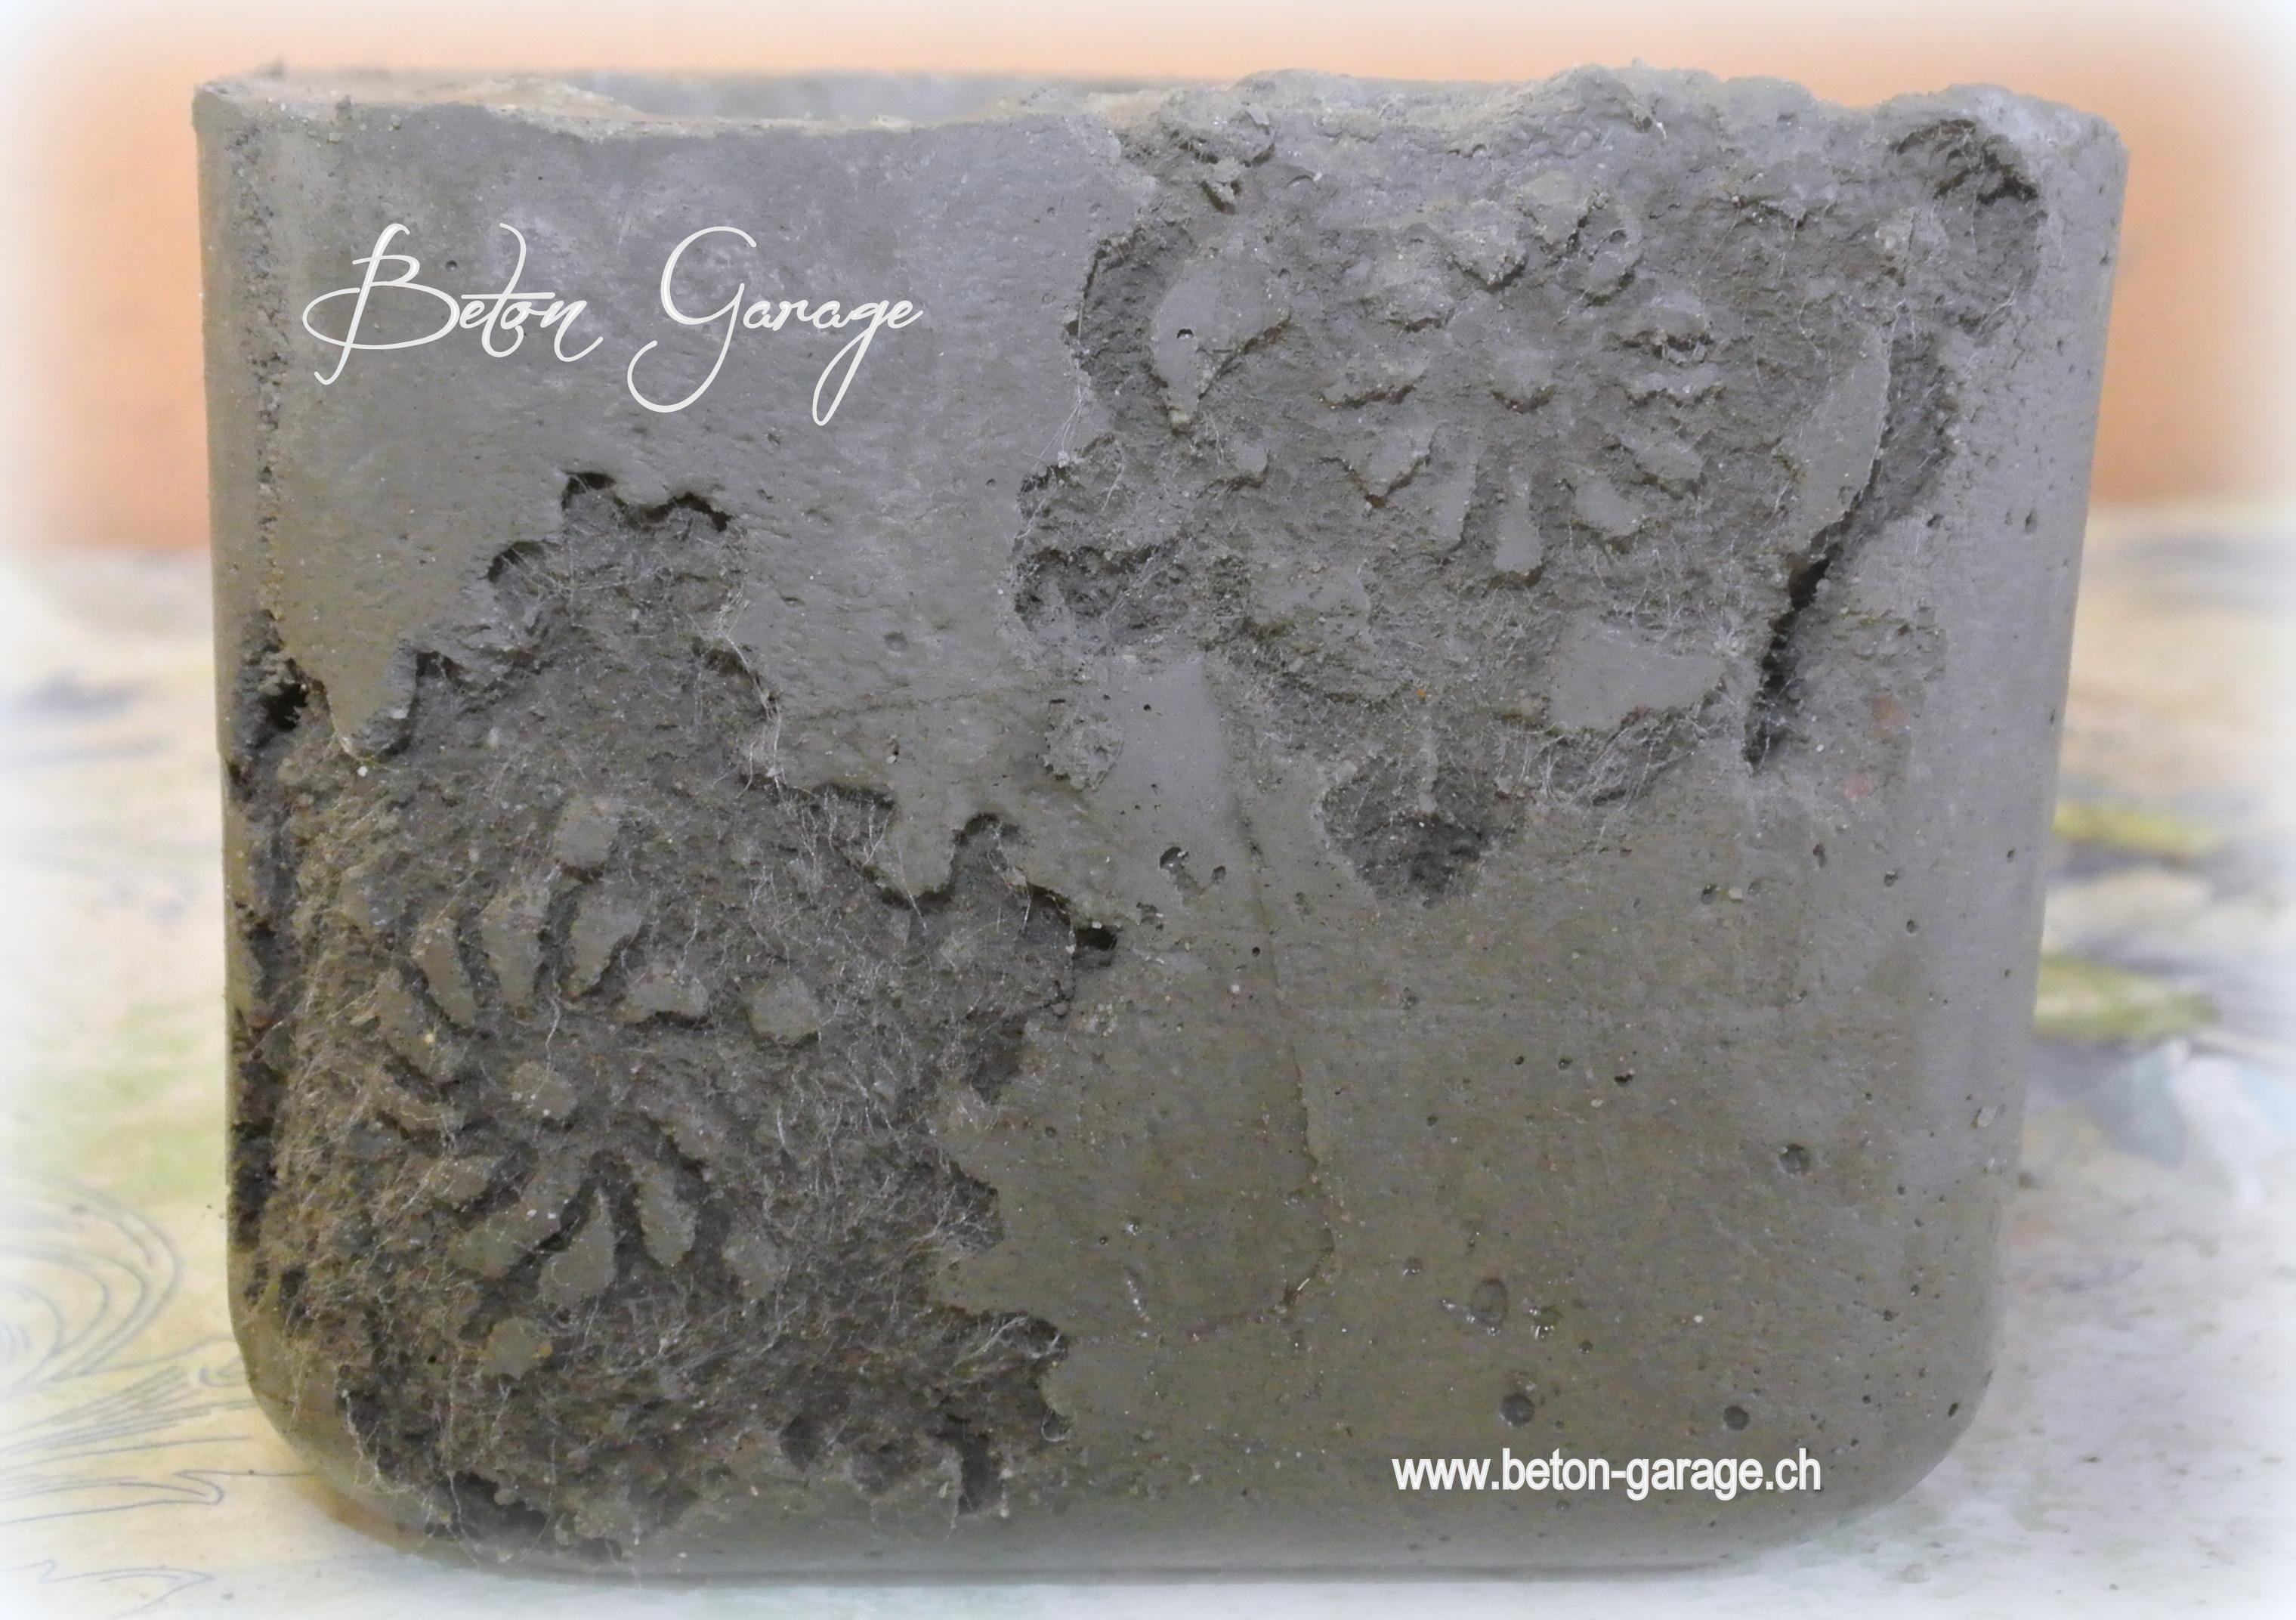 Kurse geschenke betonkurse giessformen - Beton weihnachtsdeko ...